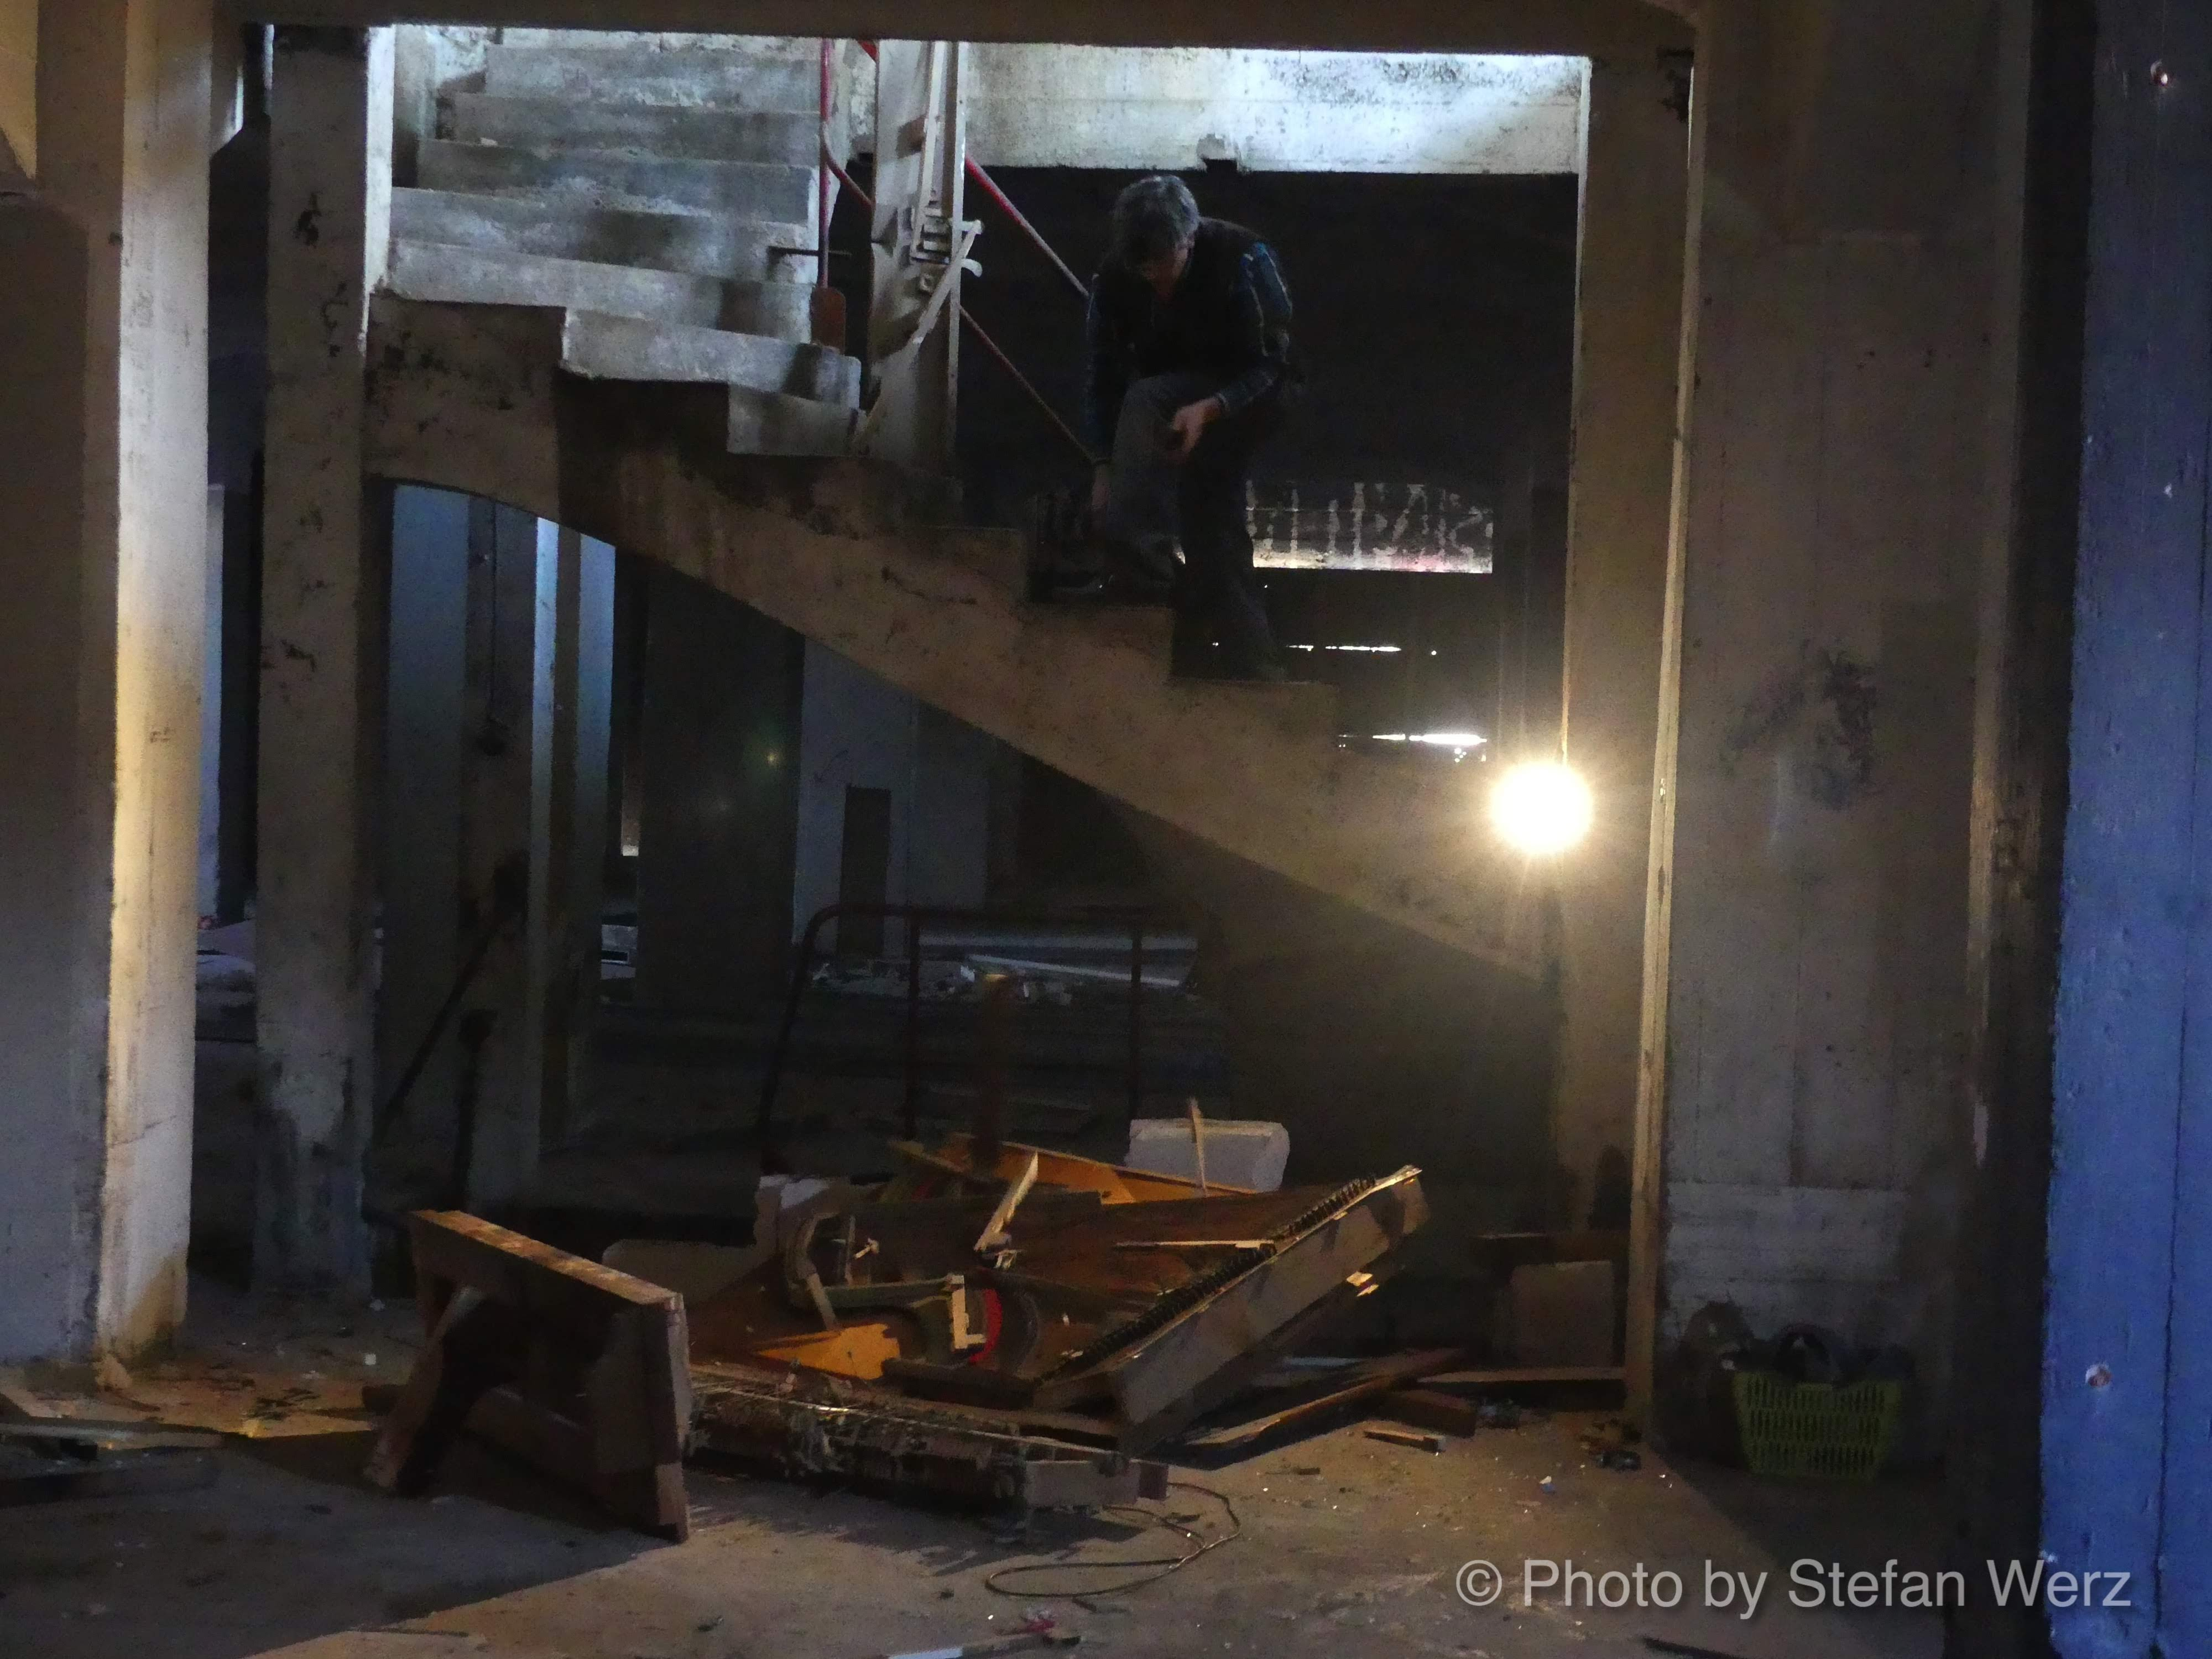 Photo: Action artist Mirko Siakkou Flodin Lagerhaus Film - shooting Zombi Piano, The Piano in Art, Soundsession, Photo curtesy Stefan Werz